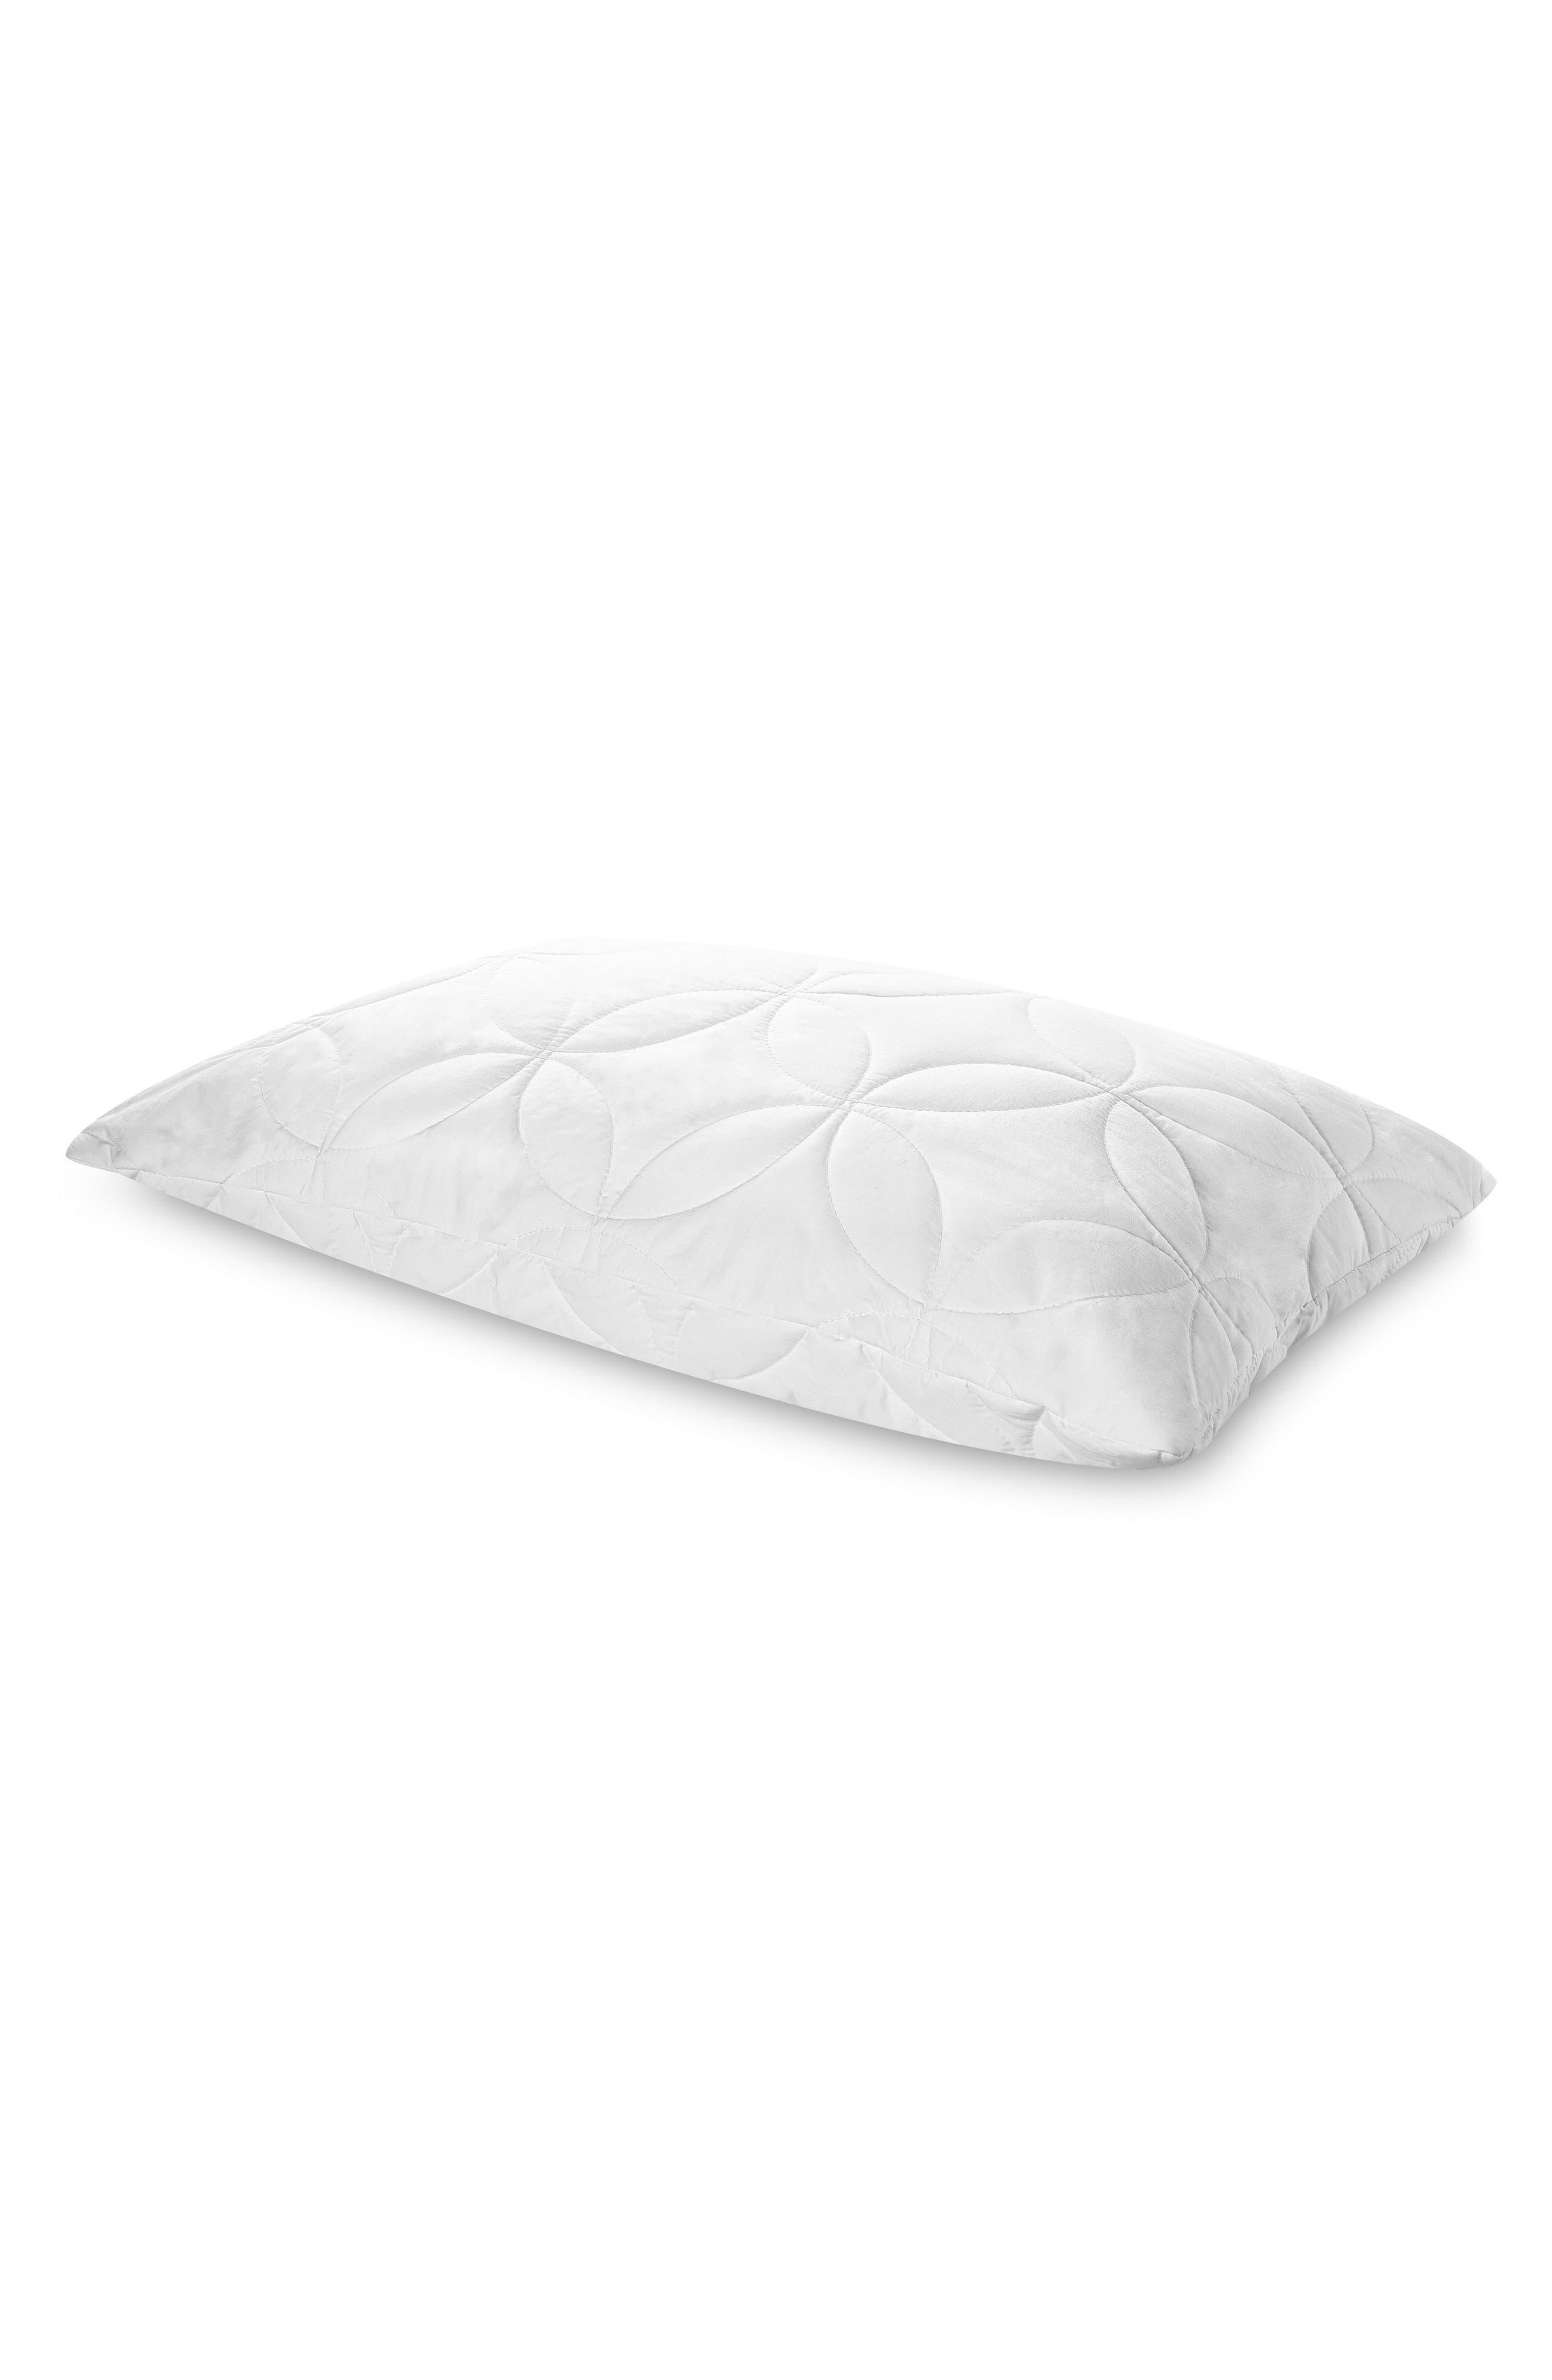 TEMPUR-Cloud Soft & Lofty Pillow,                             Main thumbnail 1, color,                             WHITE